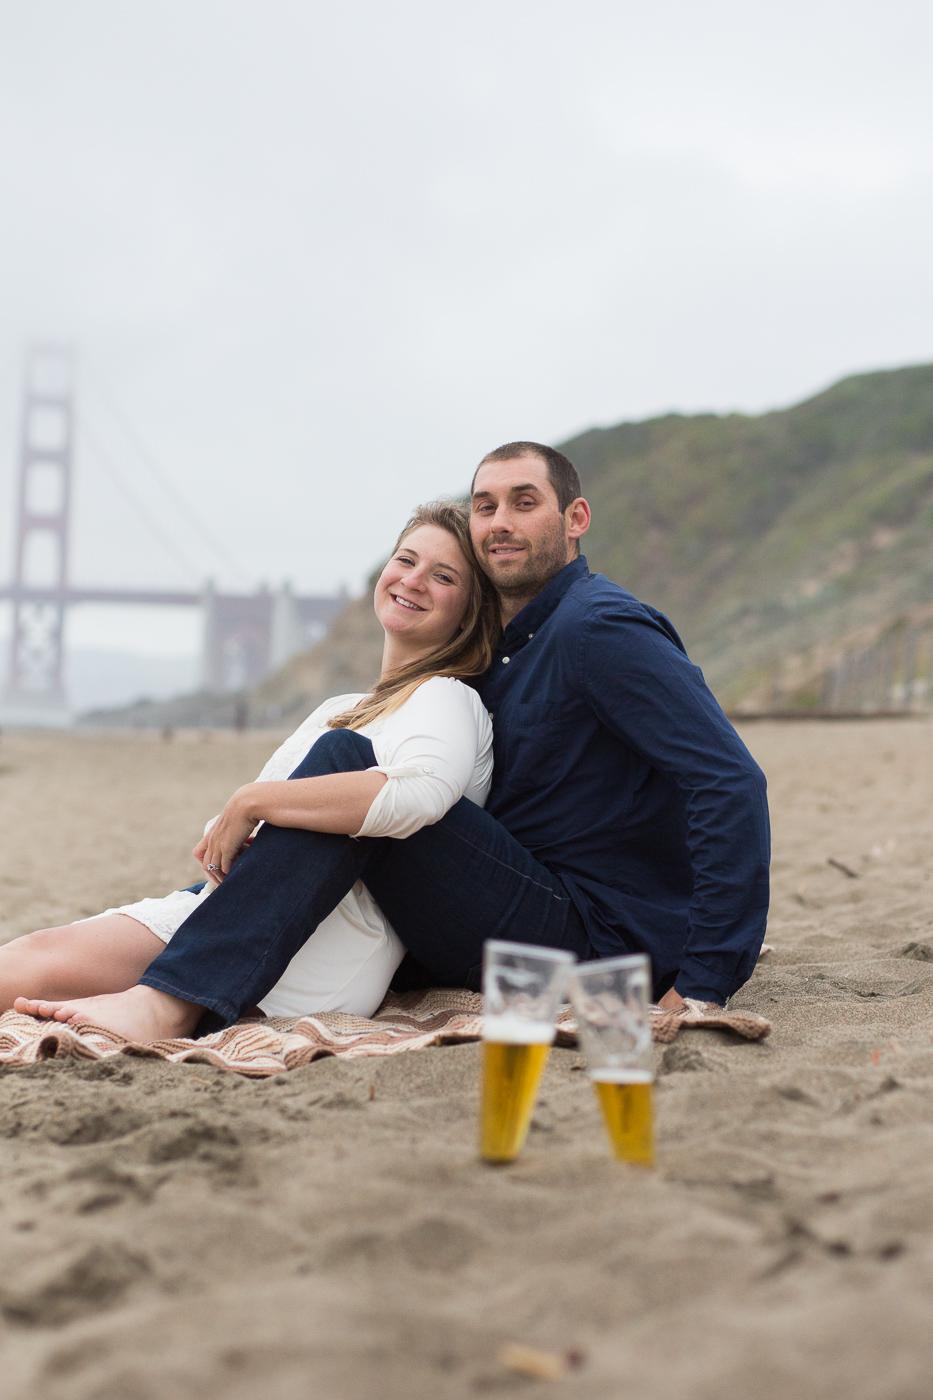 Baker-beach-san-francisco-california-engagement-session-12.jpg